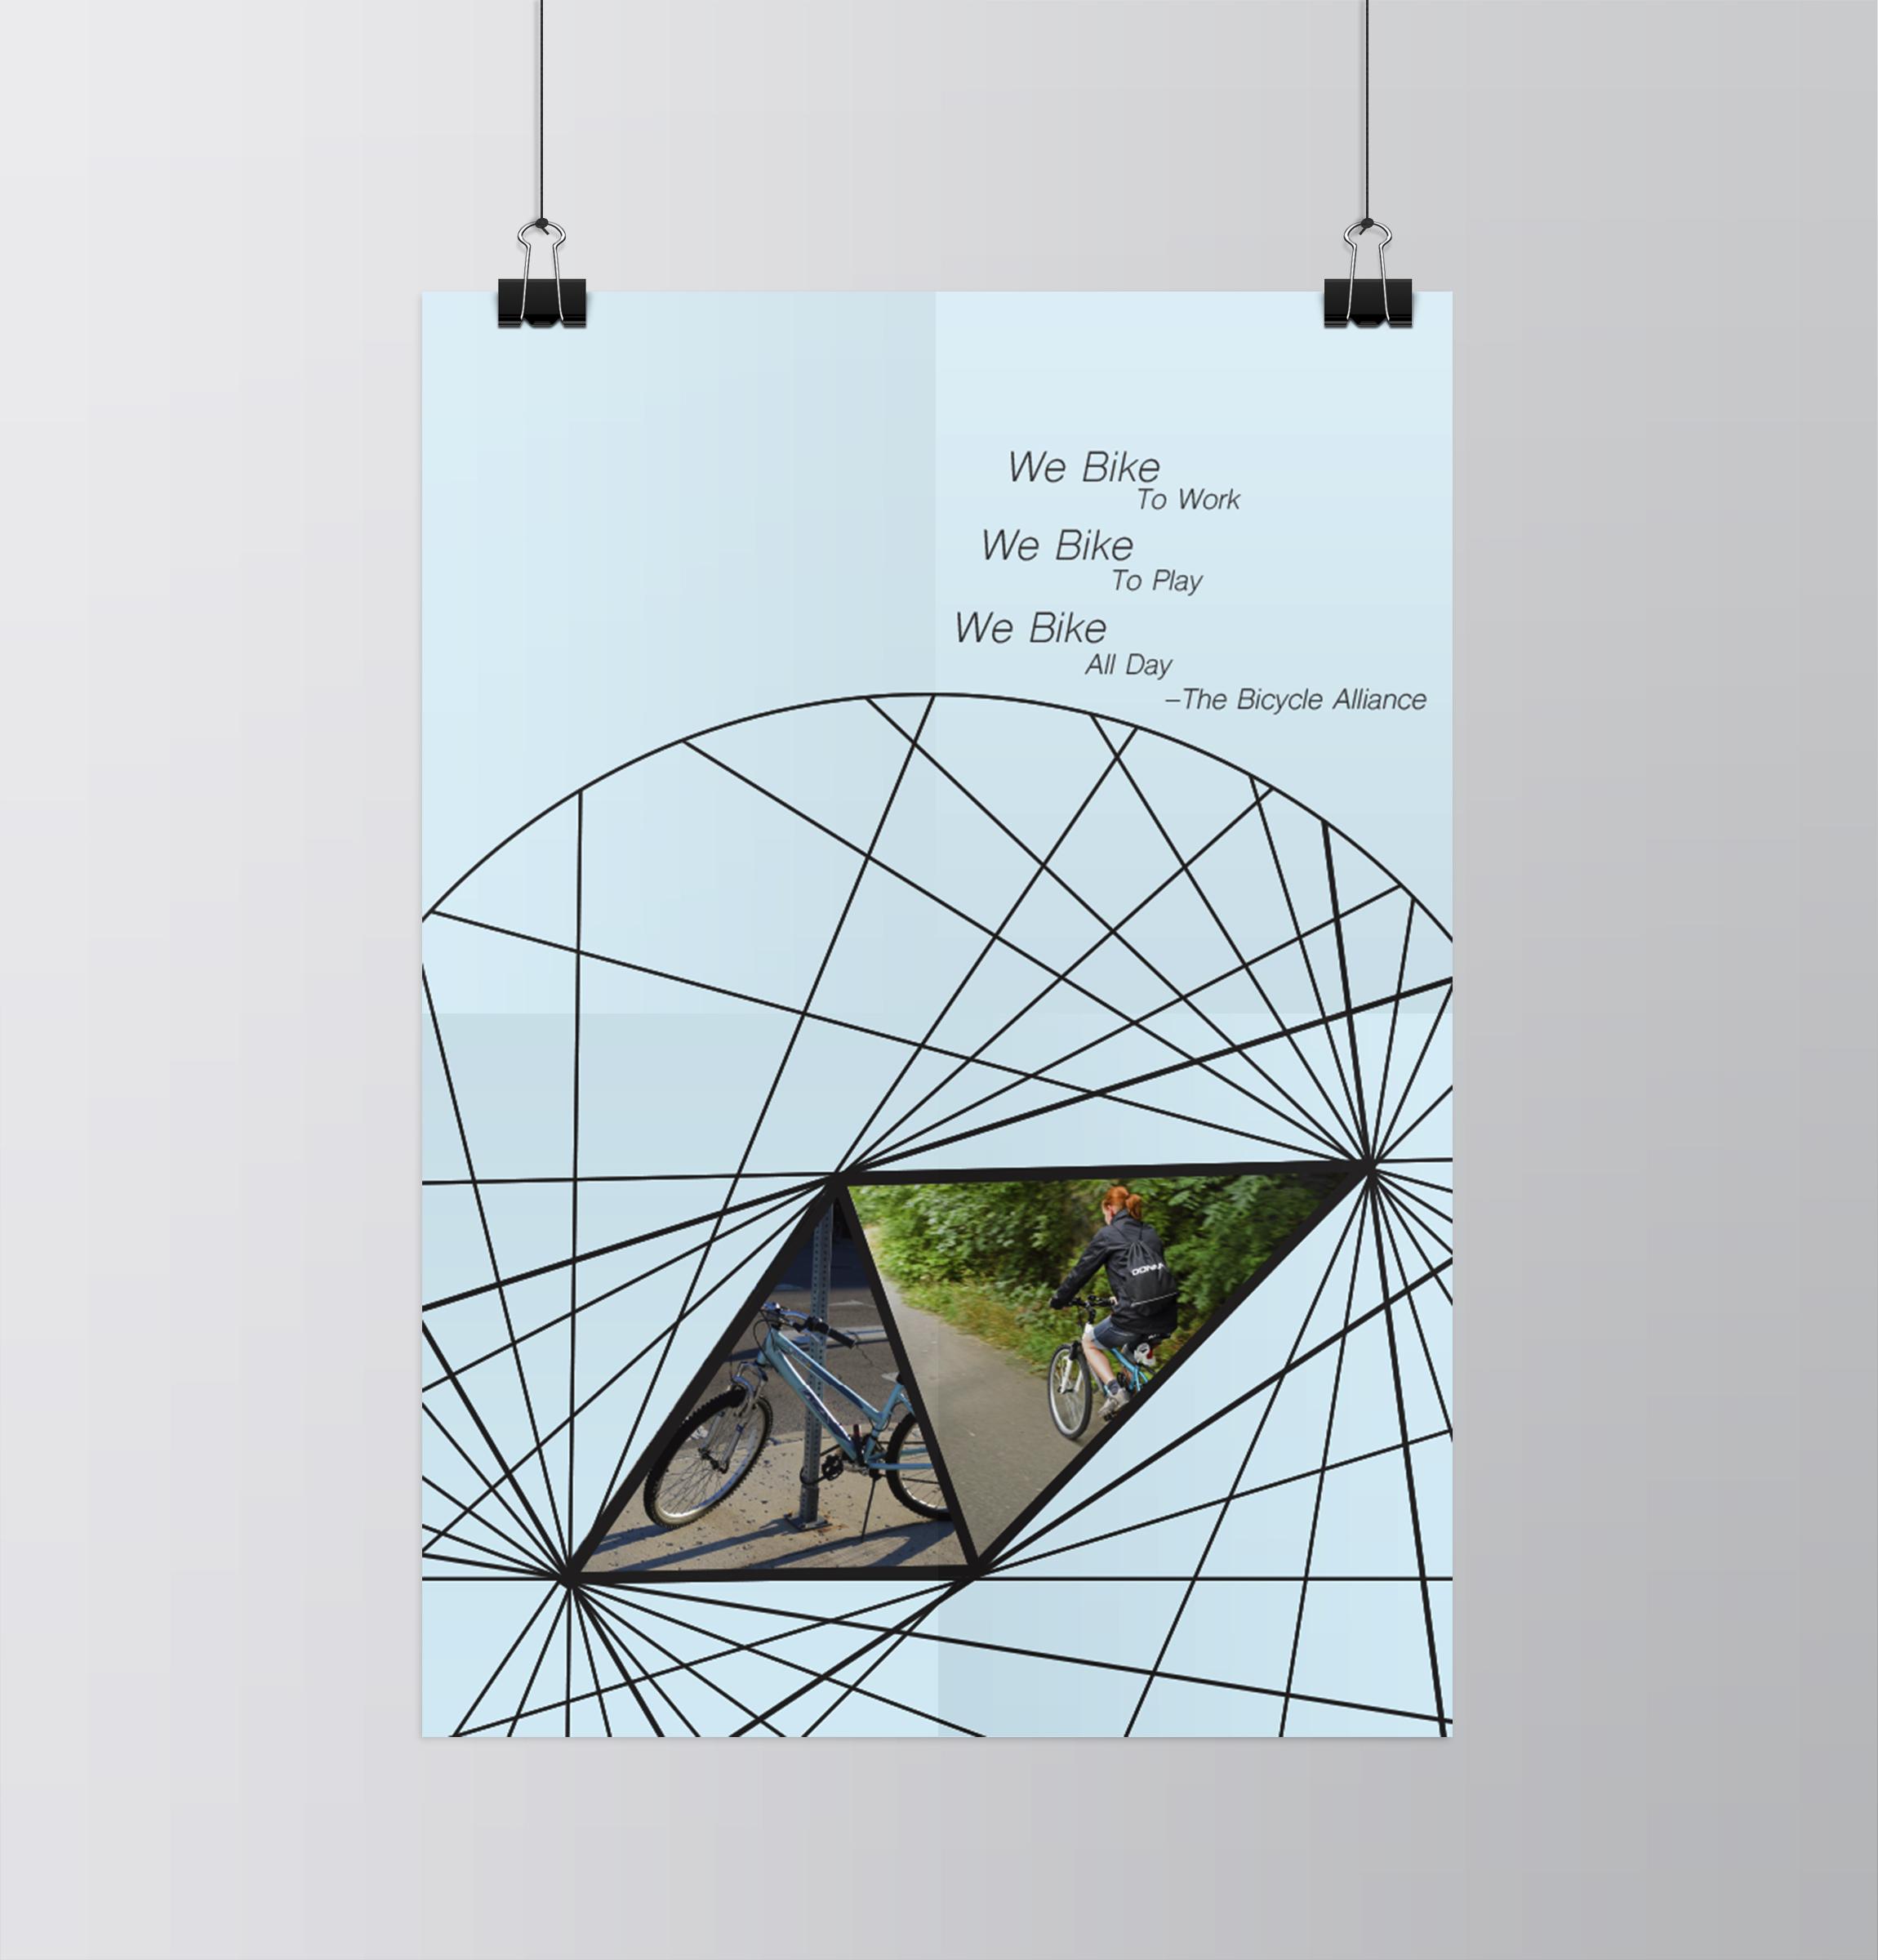 mockup-poster-vol2.jpg